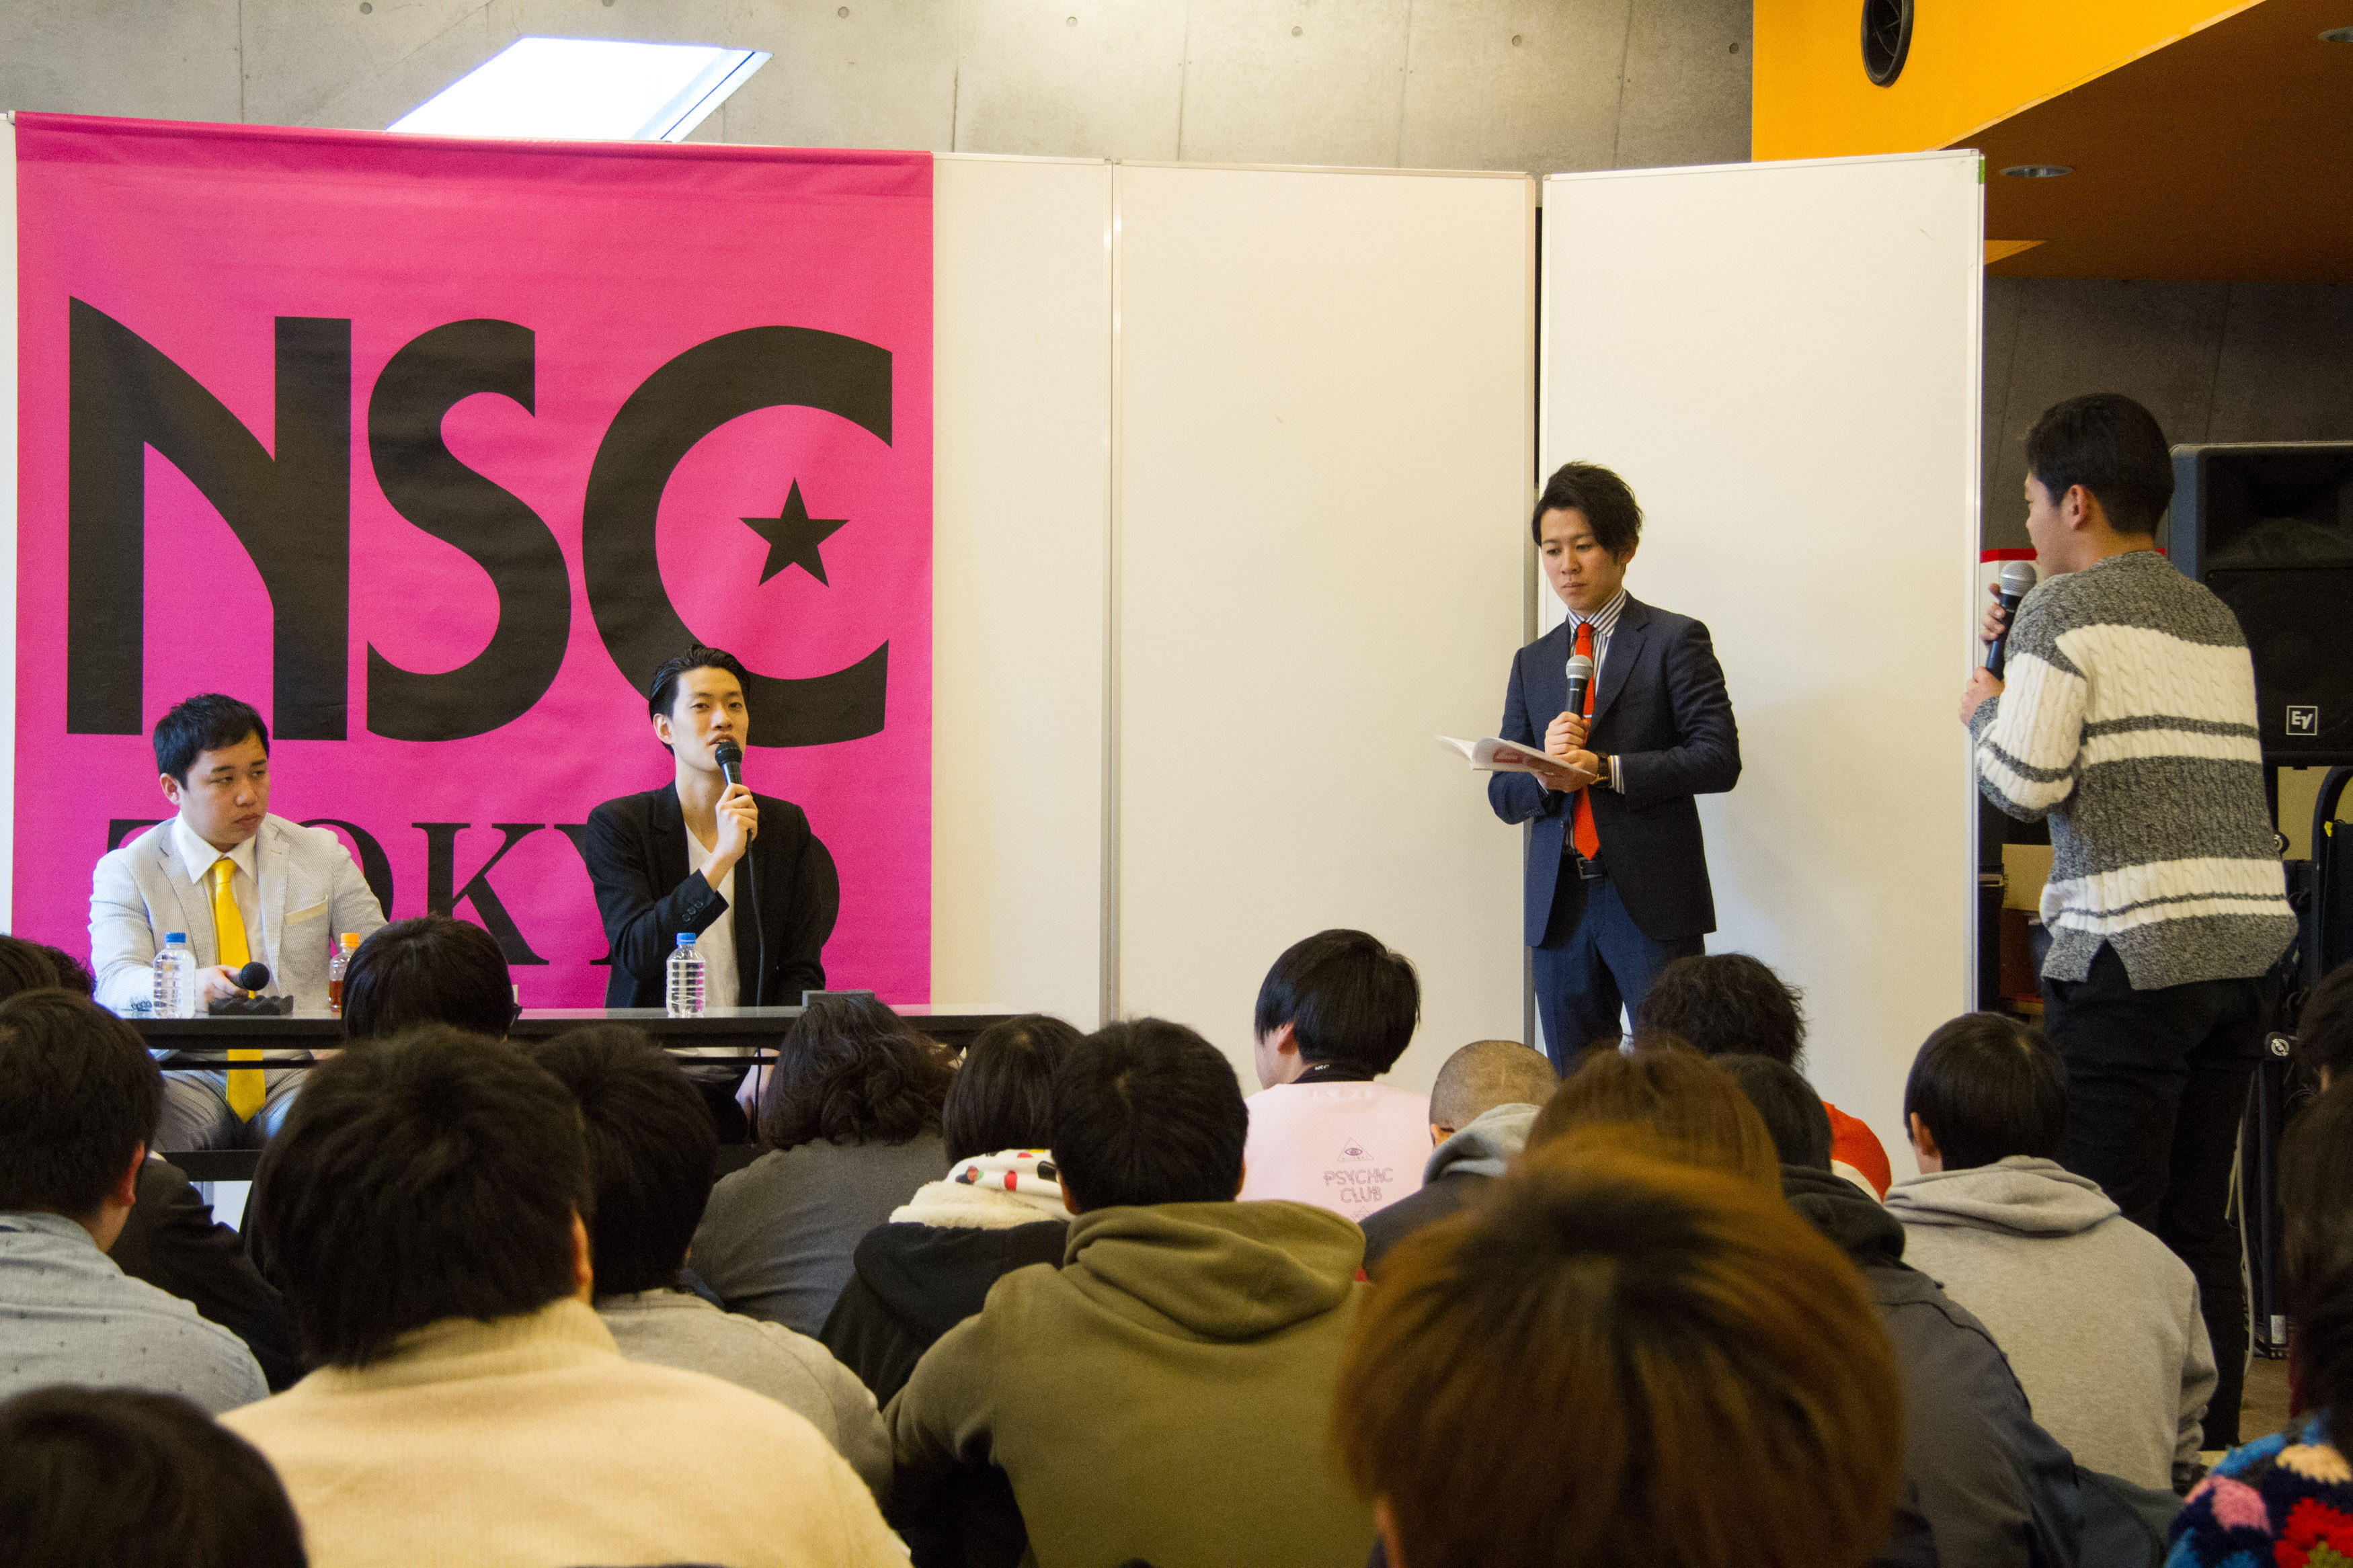 http://news.yoshimoto.co.jp/20190130233420-afff67270f1fbea0522bb1c8ddadfe48f88dbd3e.jpg